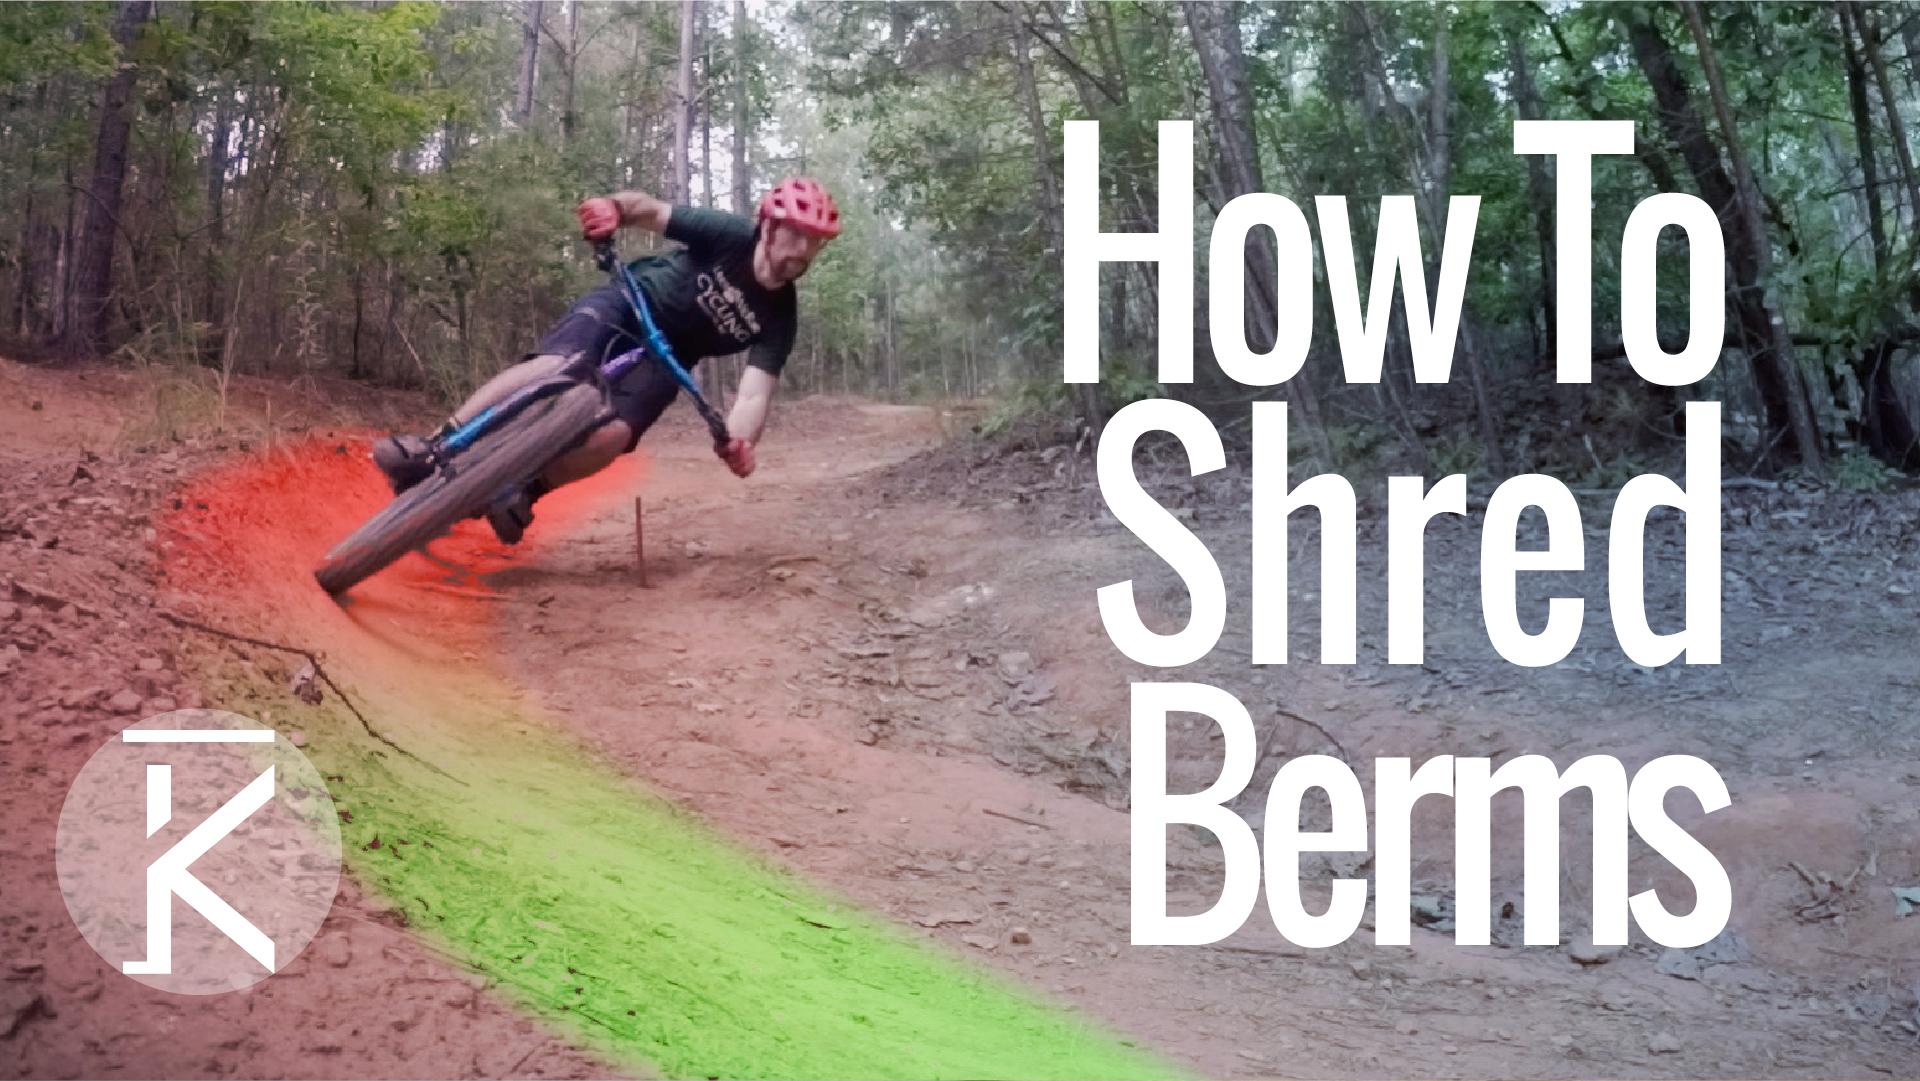 how to shred berms philkmetz mountain biking videos vital mtb. Black Bedroom Furniture Sets. Home Design Ideas